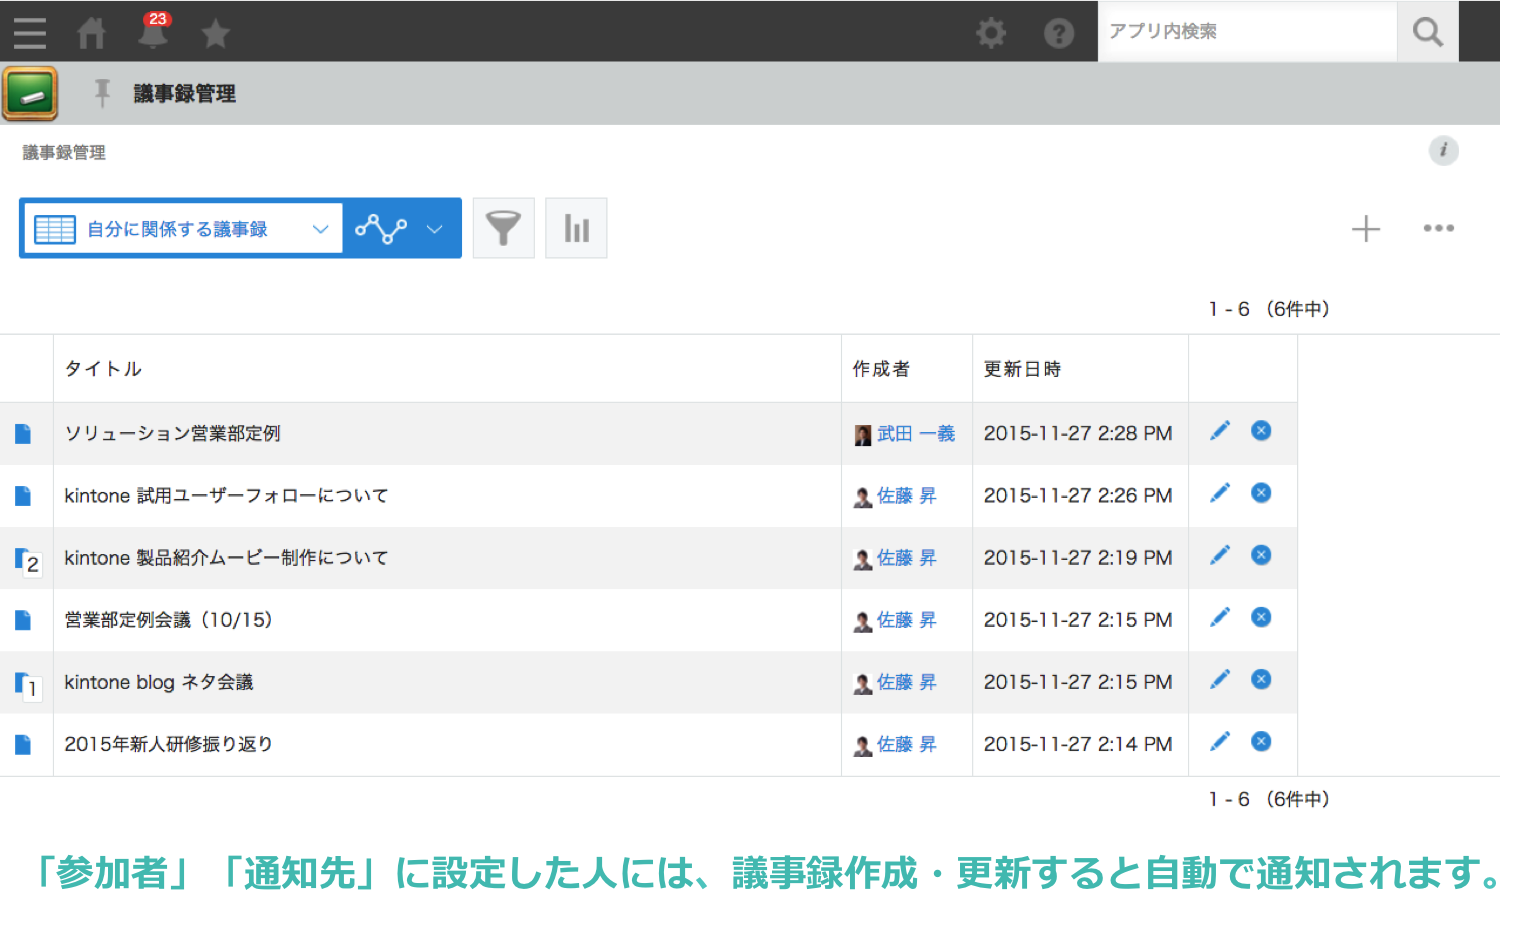 image01_giji.png